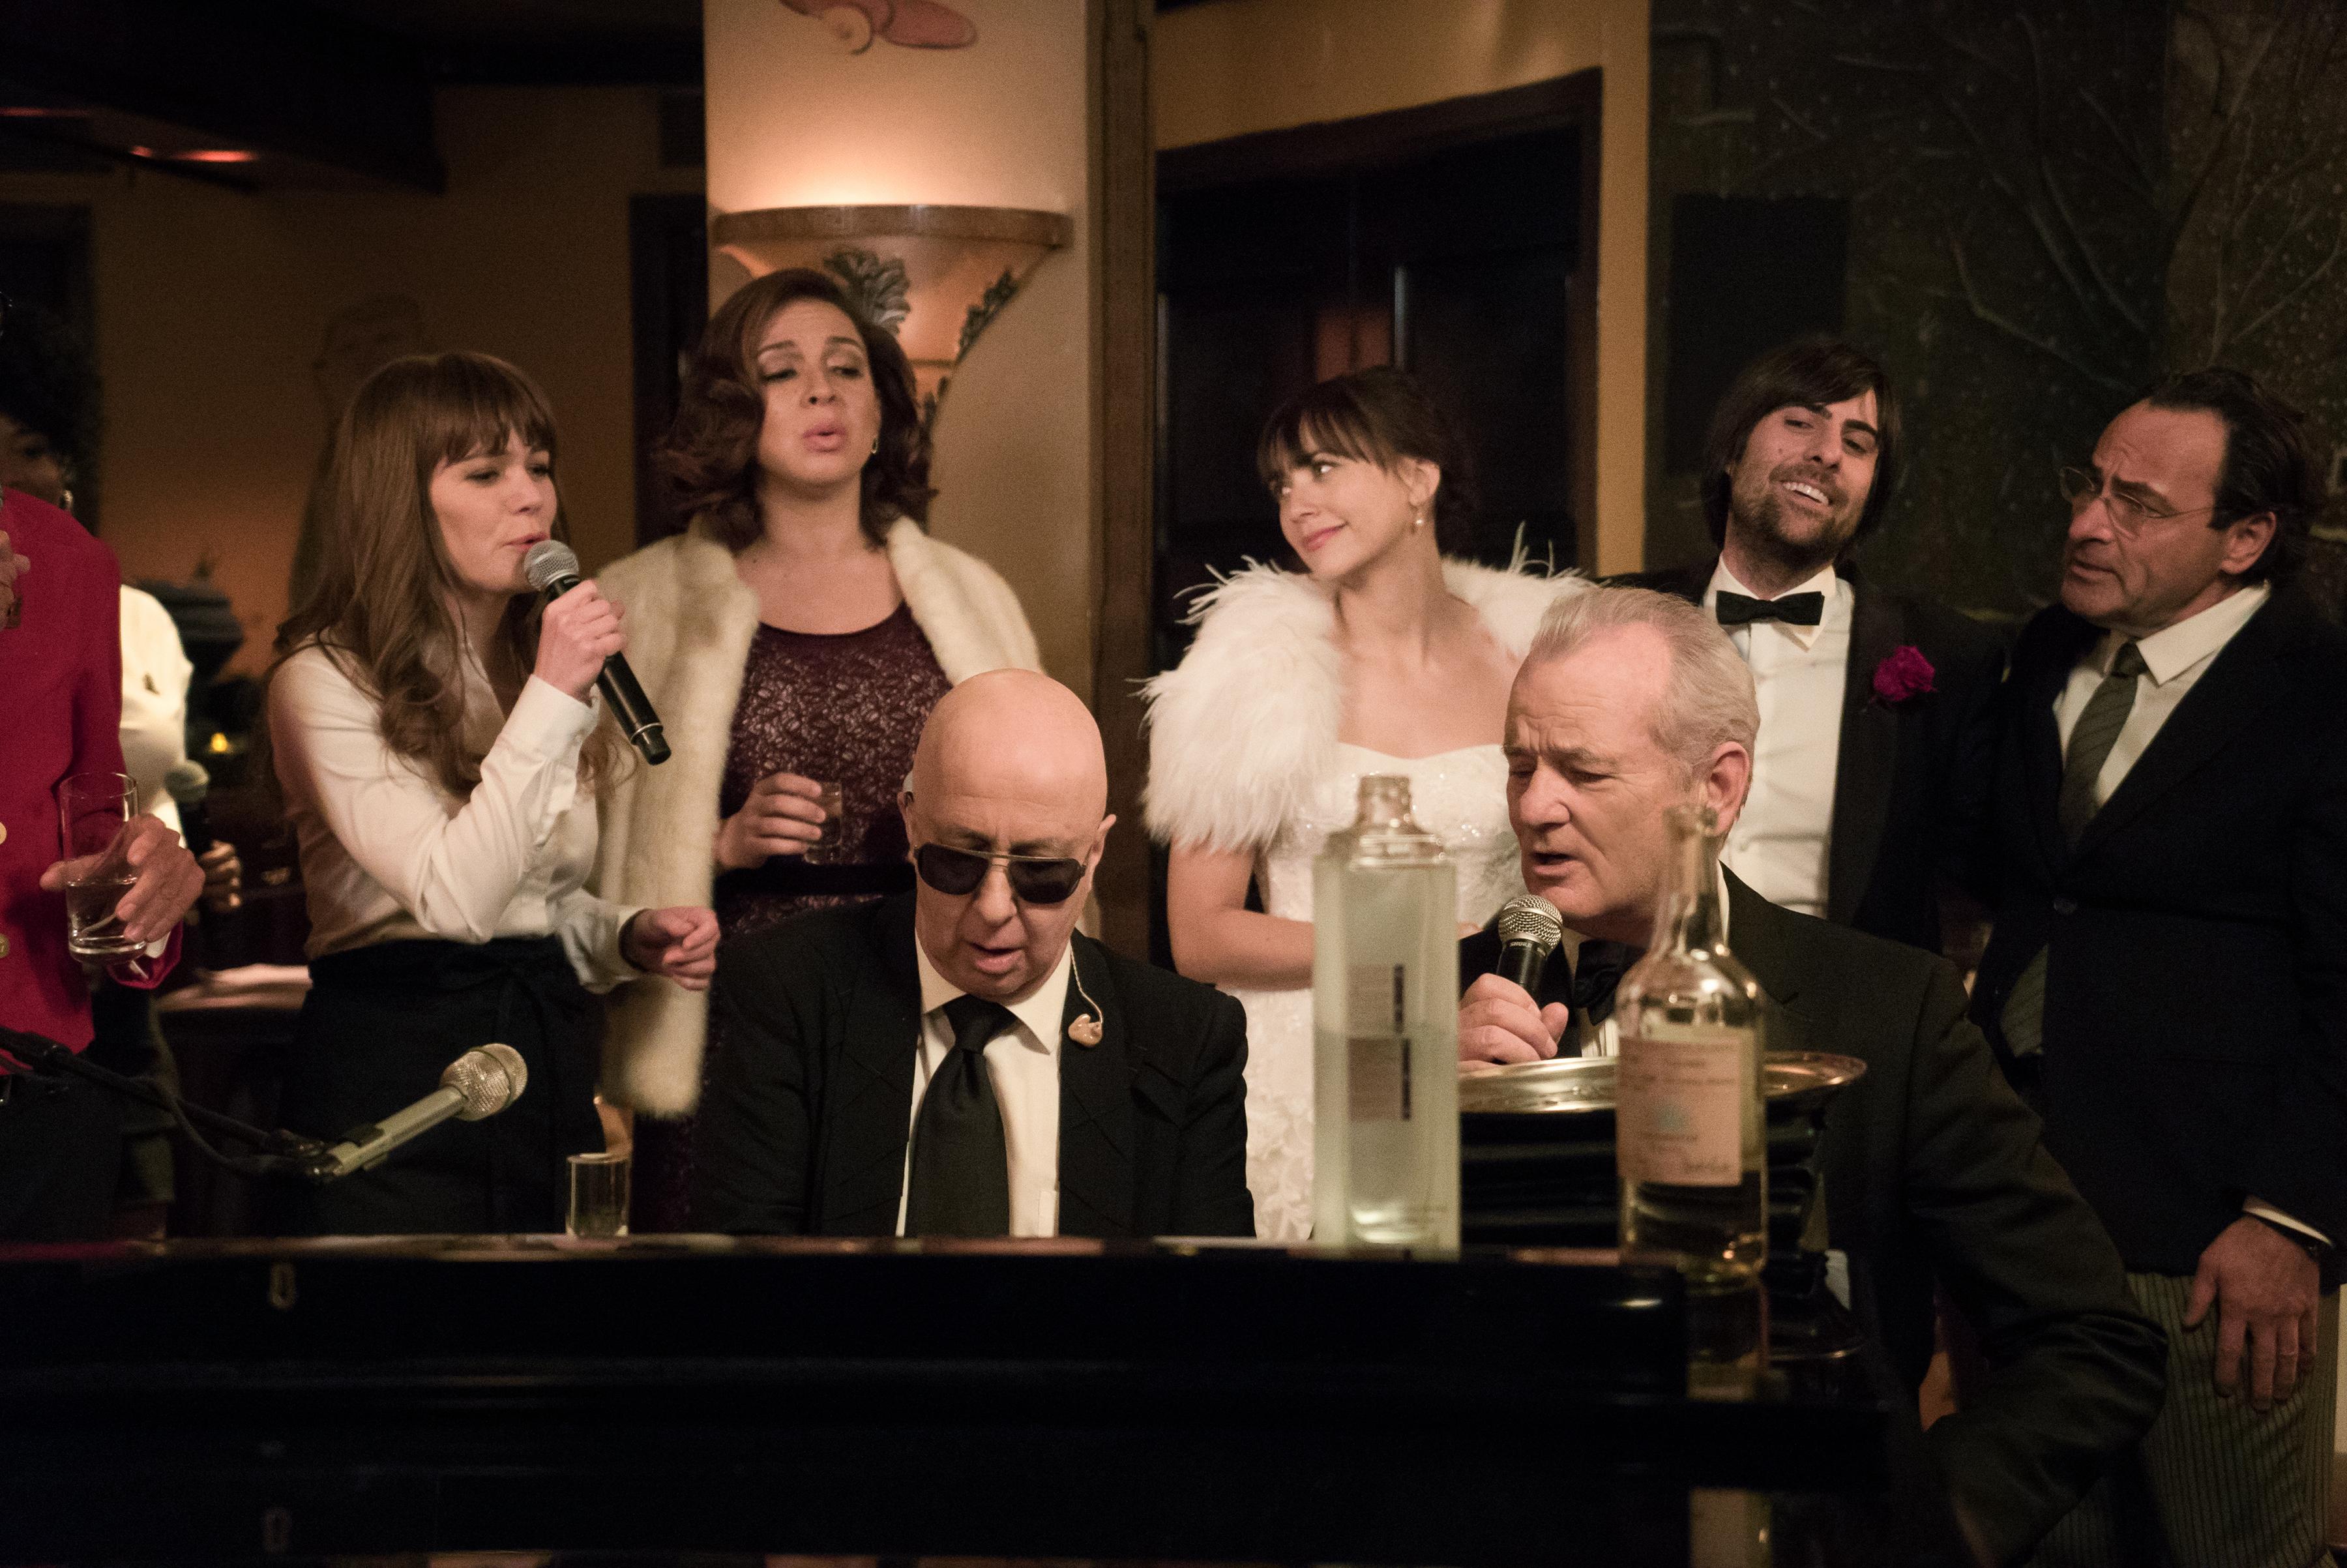 From left: Jenny Lewis, Maya Rudolph, Paul Shaffer, Rashida Jones, Bill Murray, Jason Schwartzman, and Dimitri Dimitrov in A Very Murray Christmas.